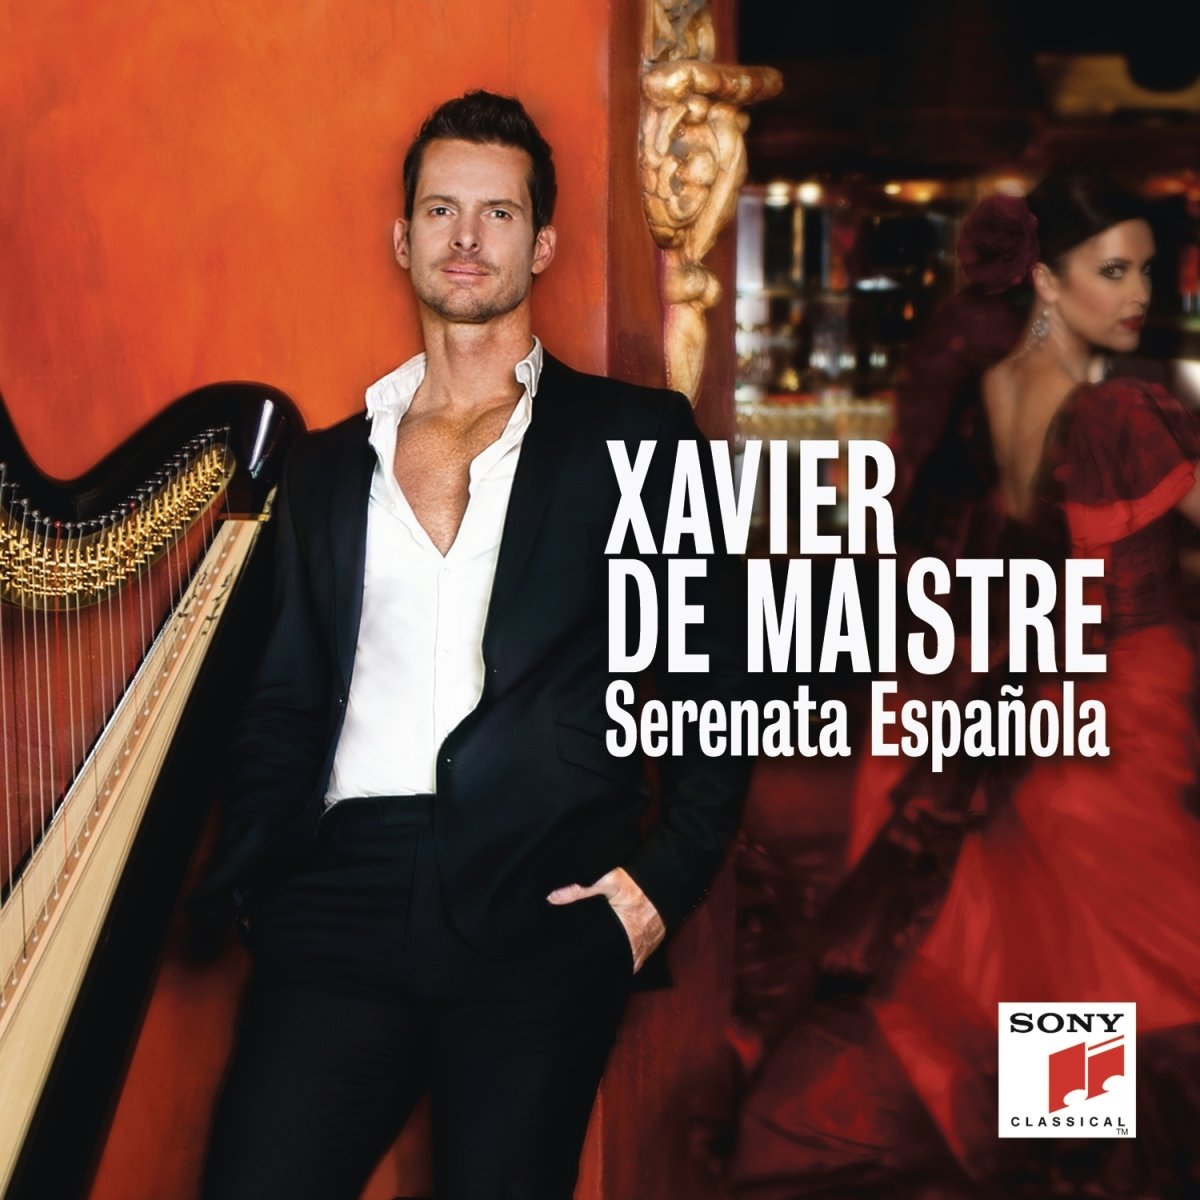 Serenata Espanola kopen